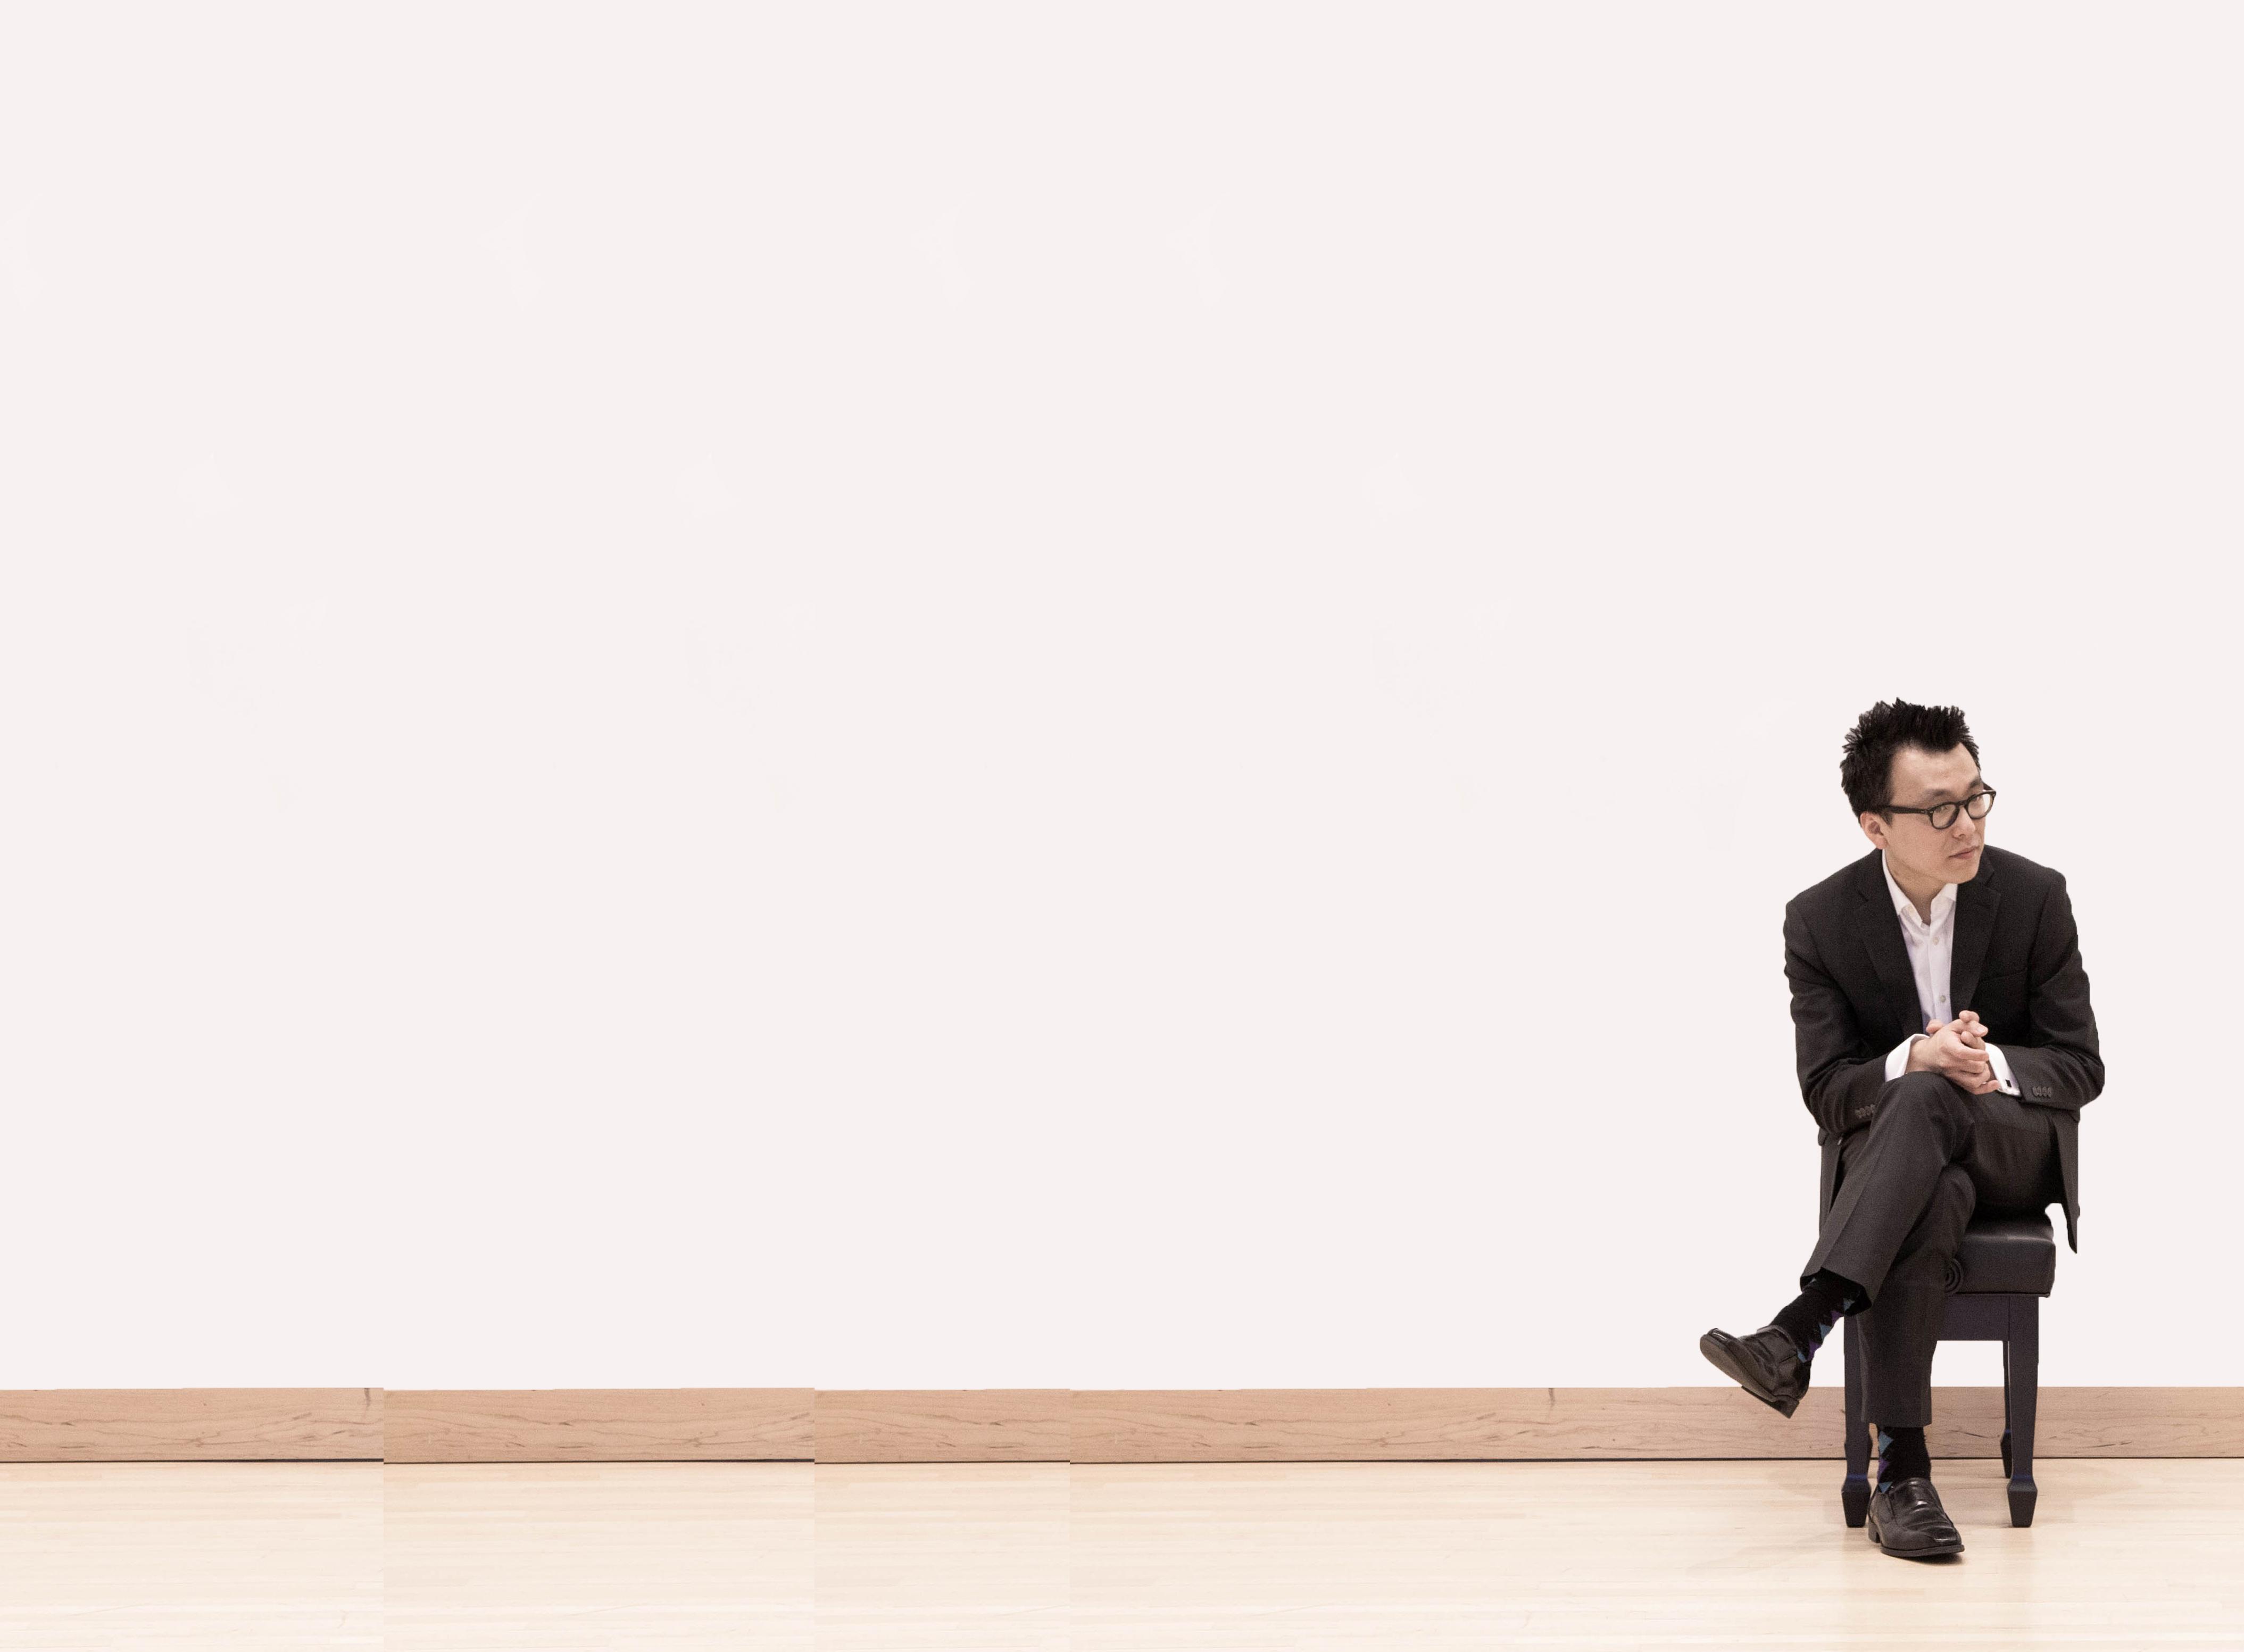 TAE KIM Live: Classical Pianist and Improvisational Artist